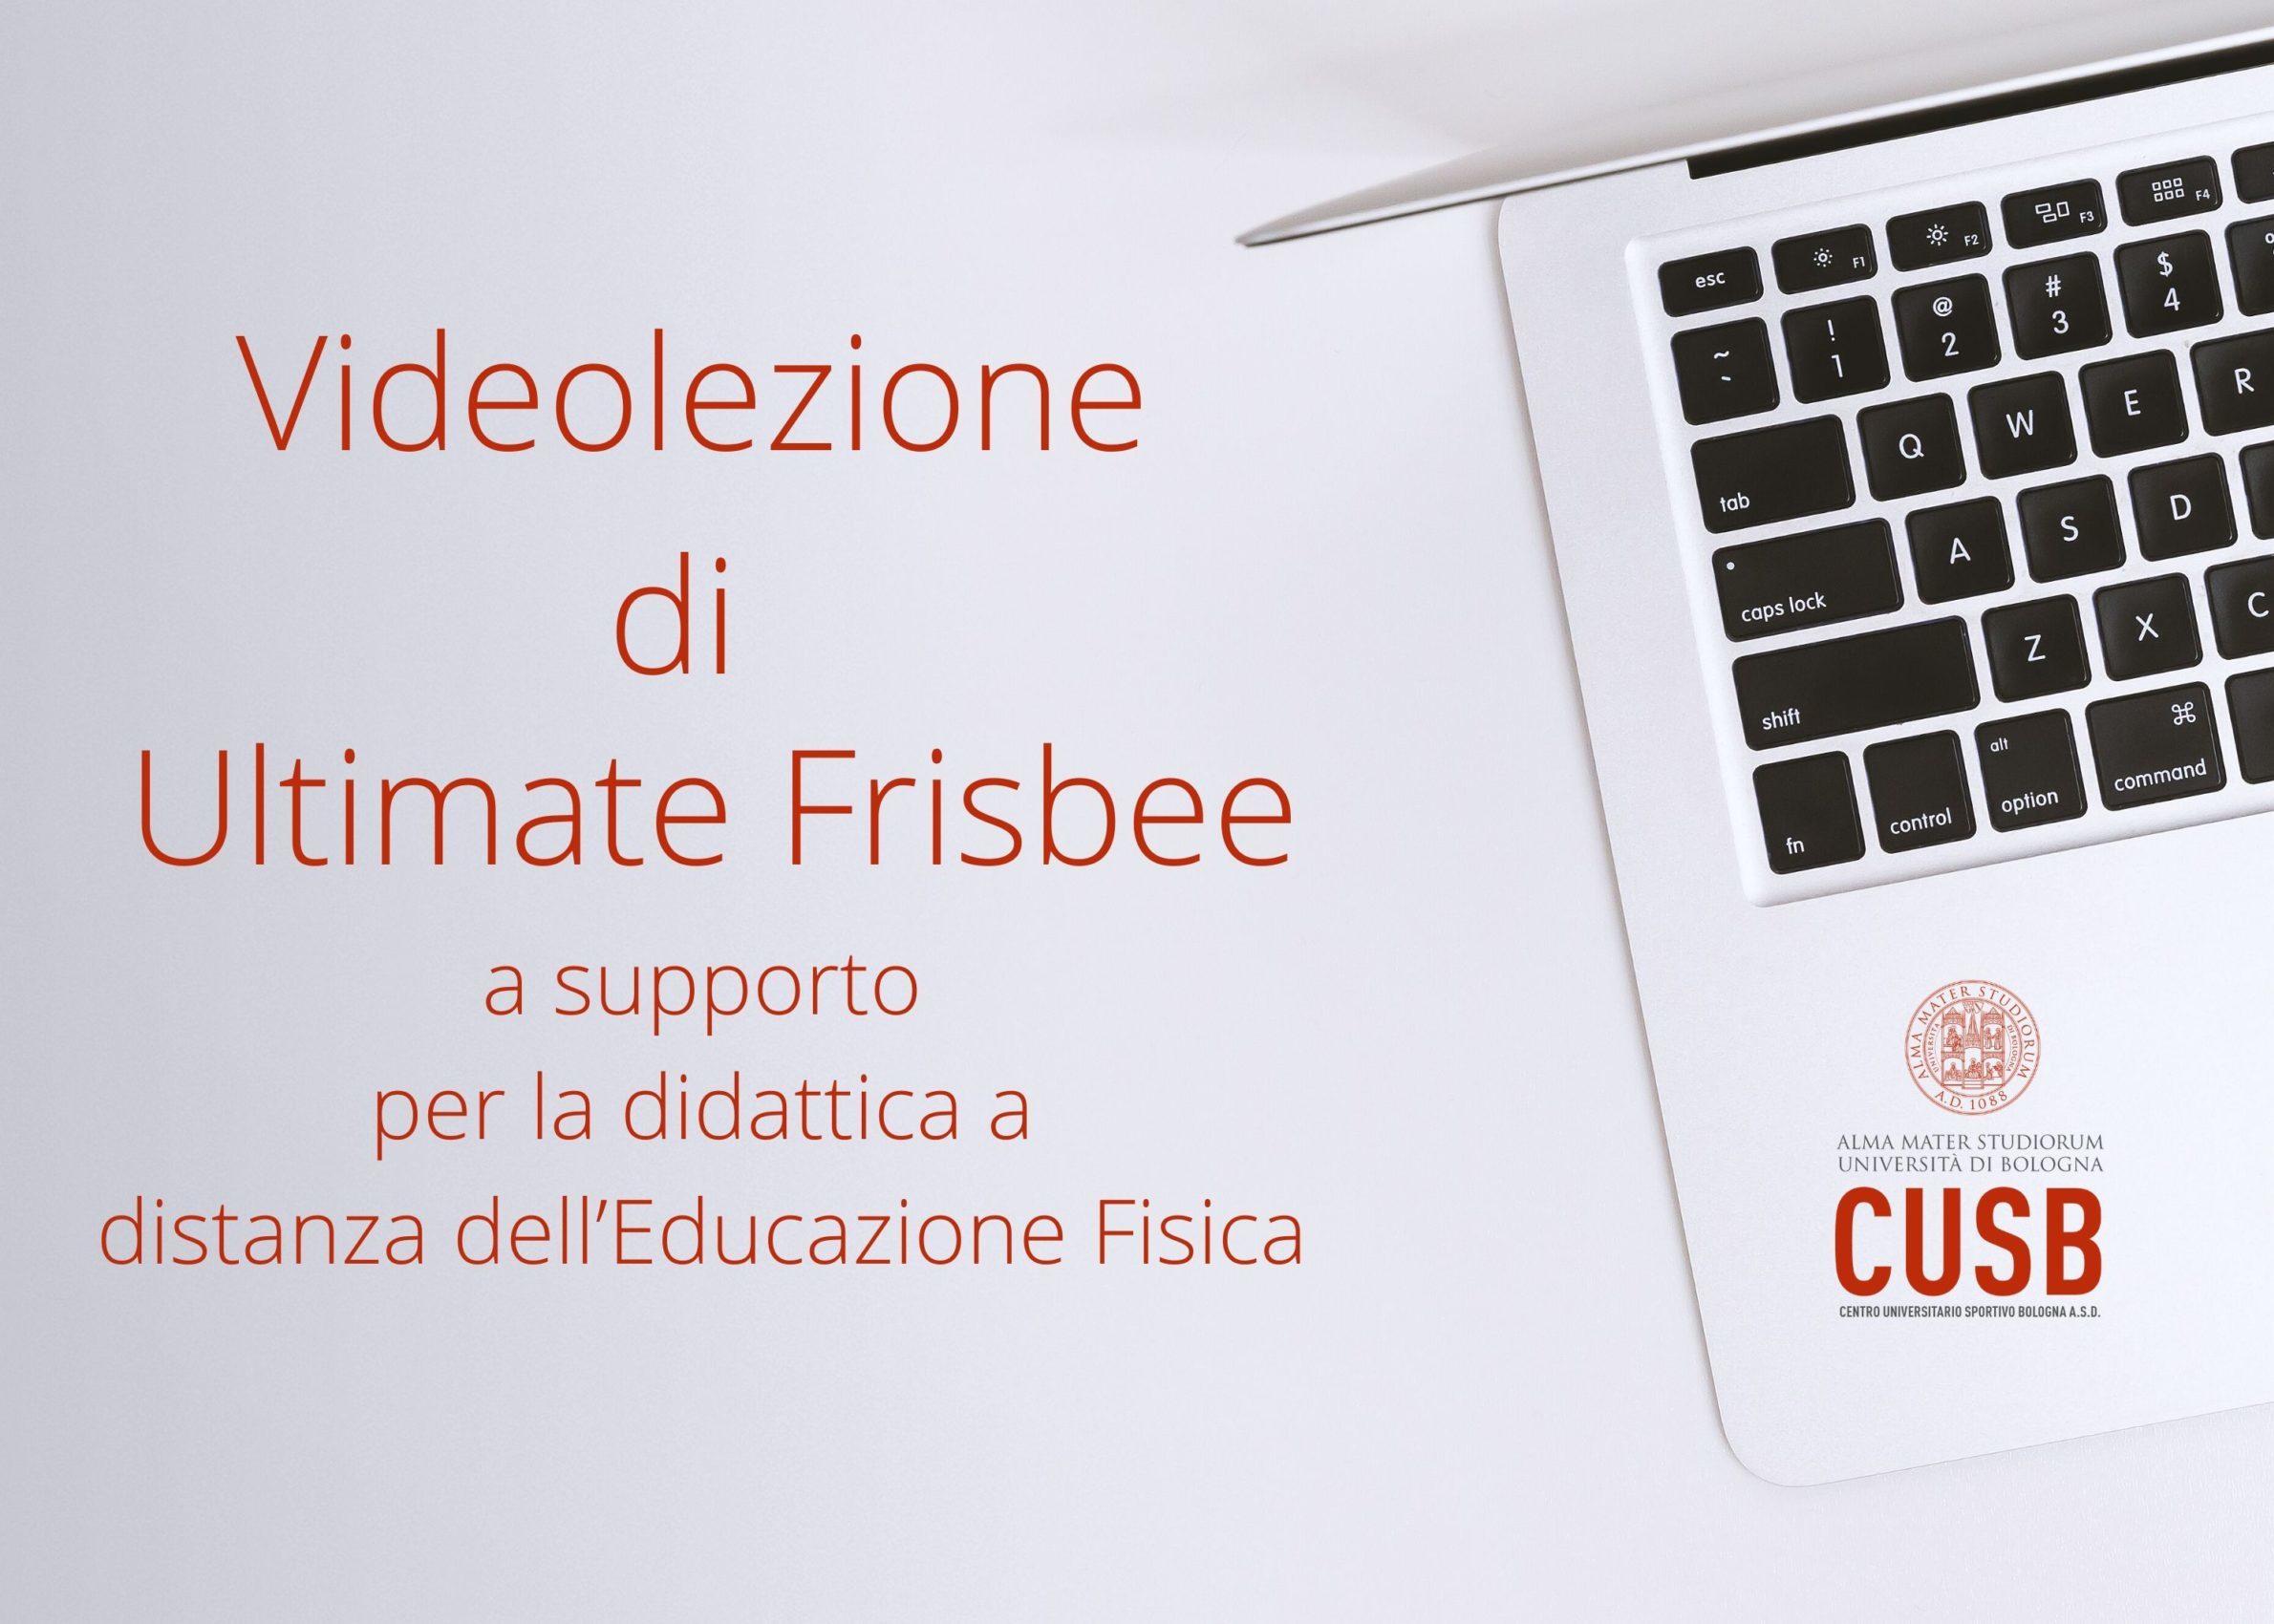 Videolezione di Ultimate Frisbee